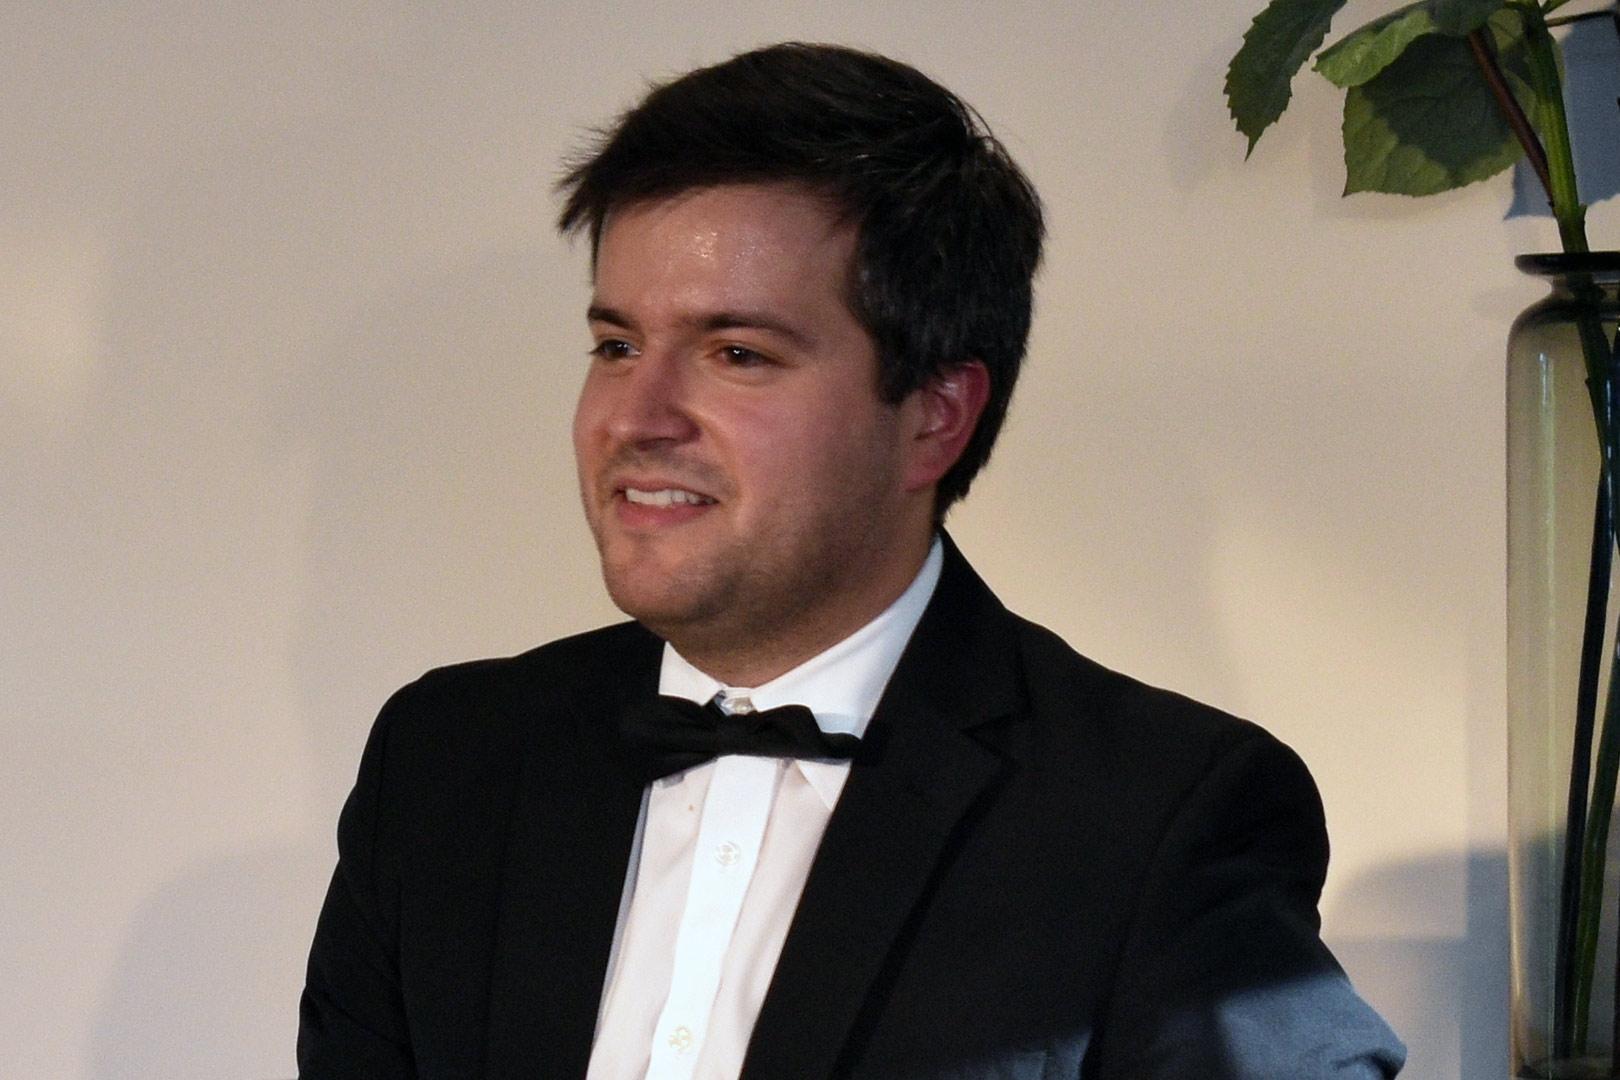 Florian Mitrea at Breinton